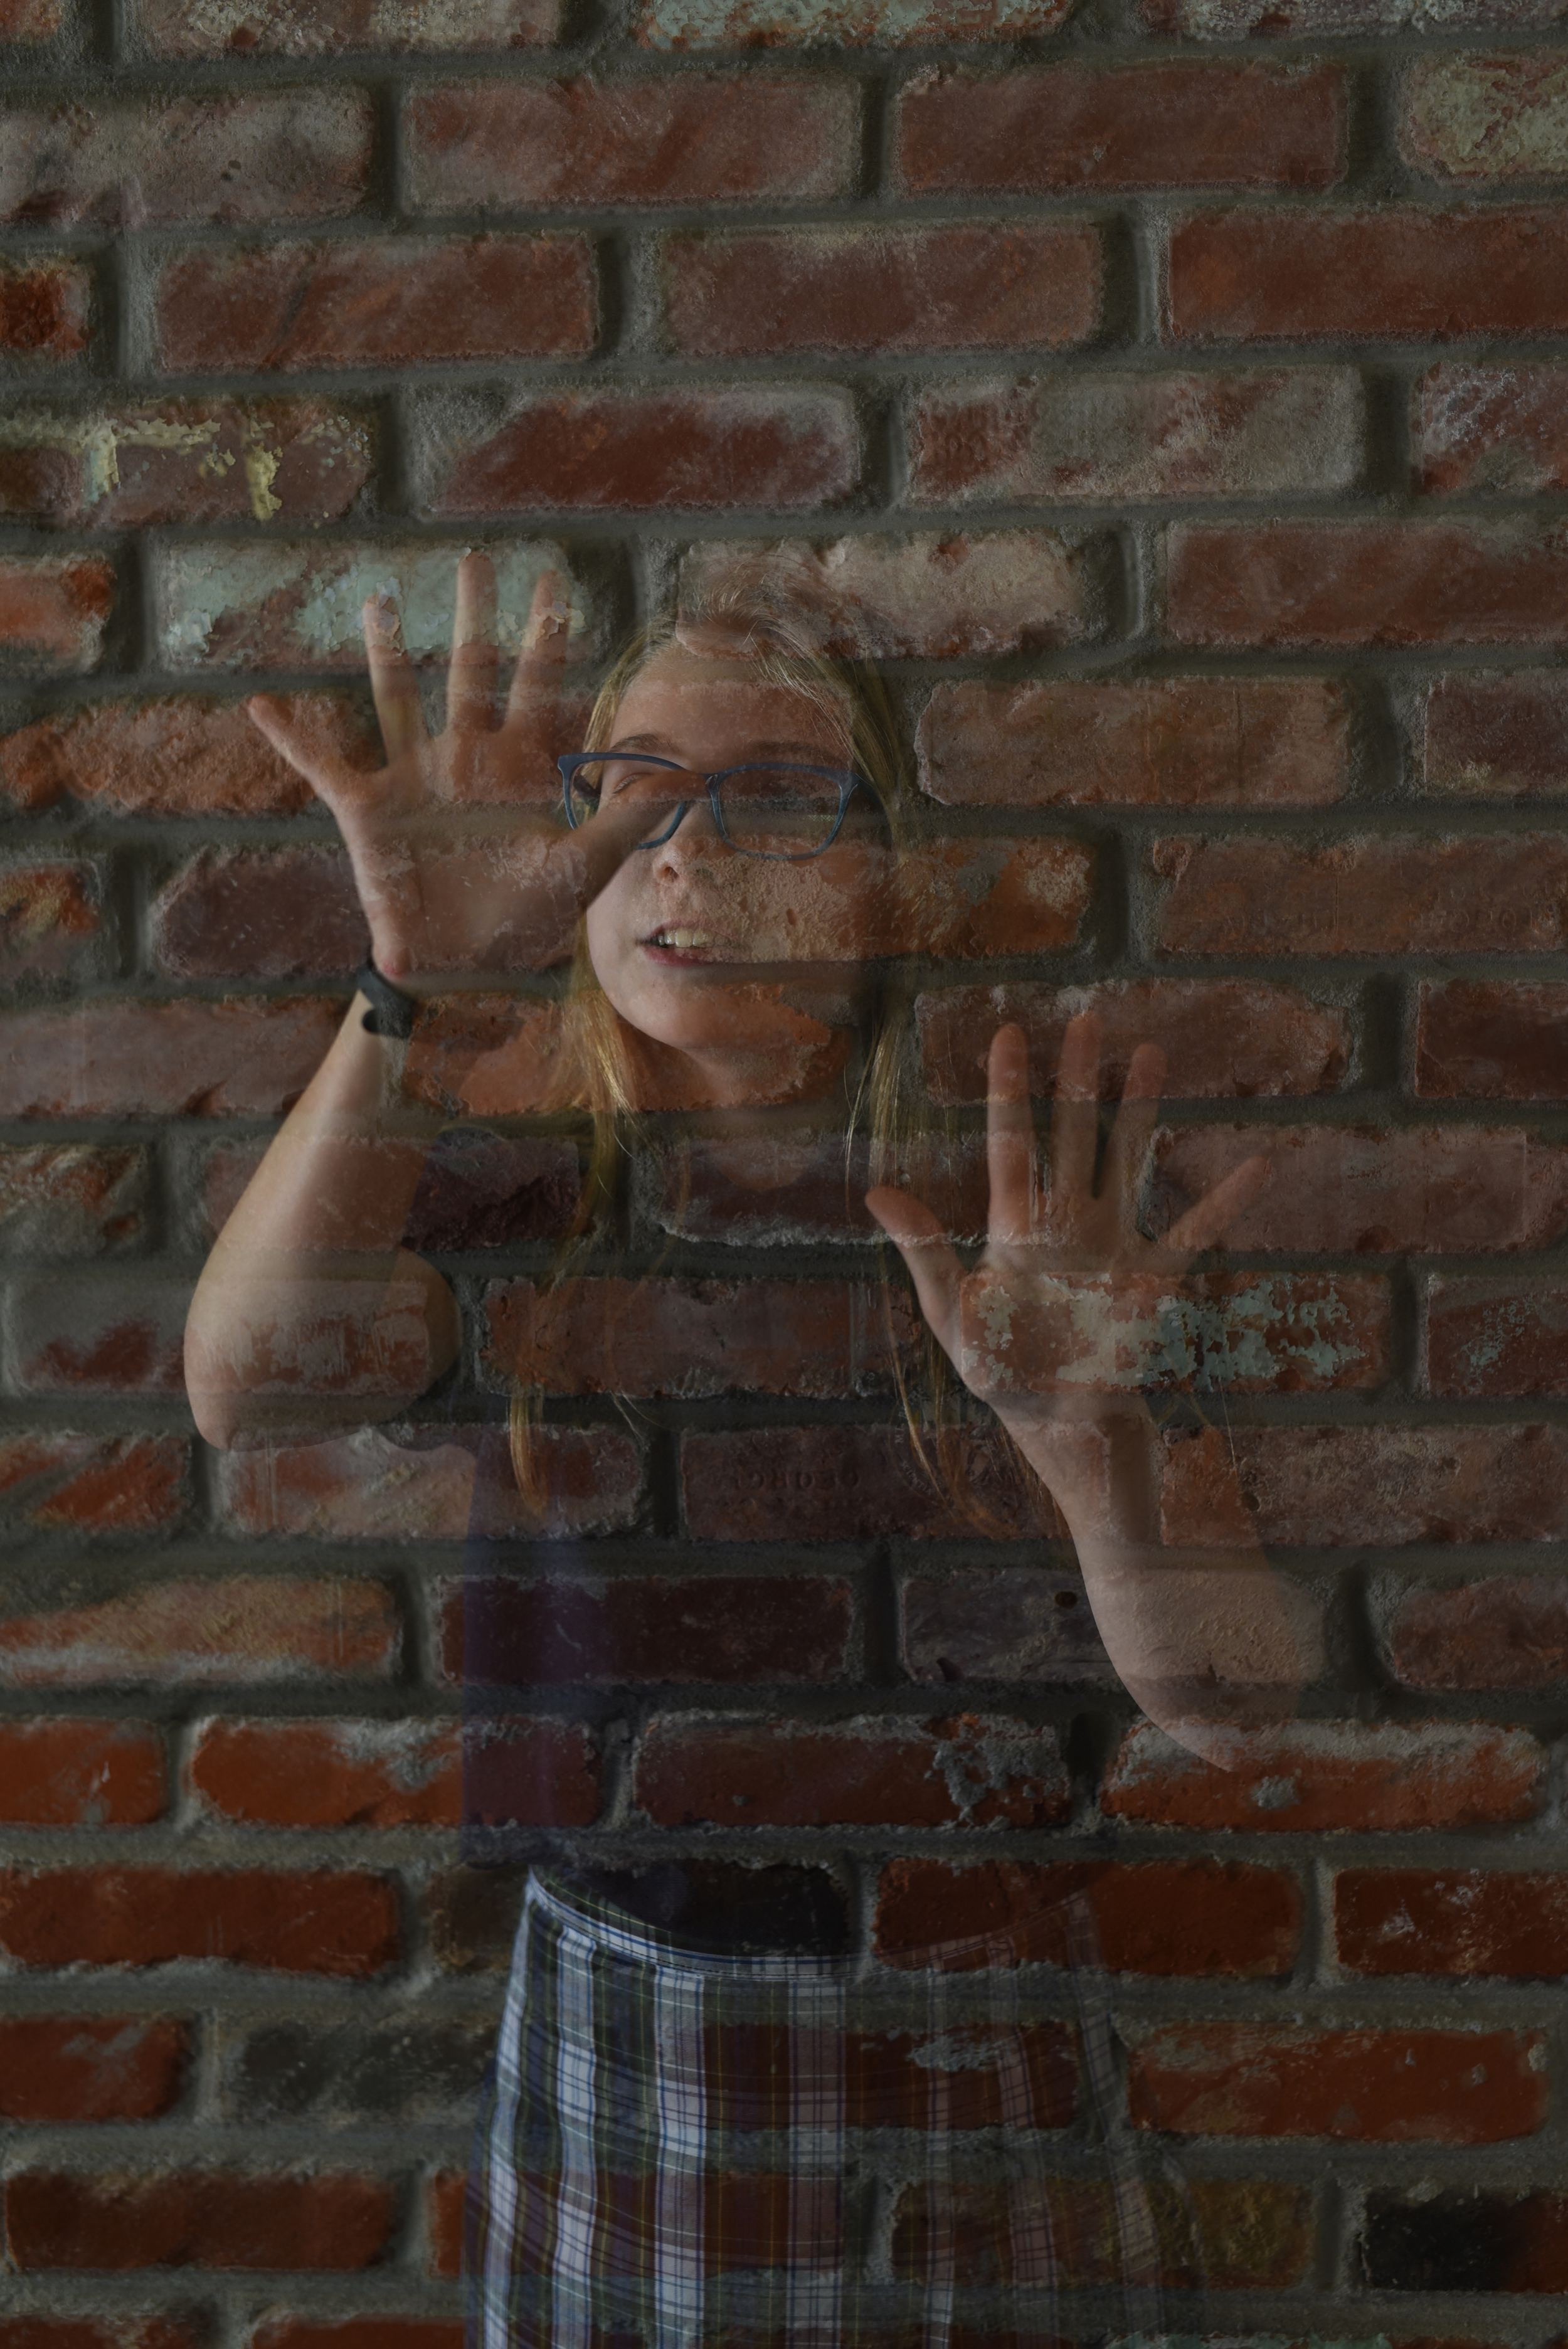 girl-stuck-in-bricks.jpg